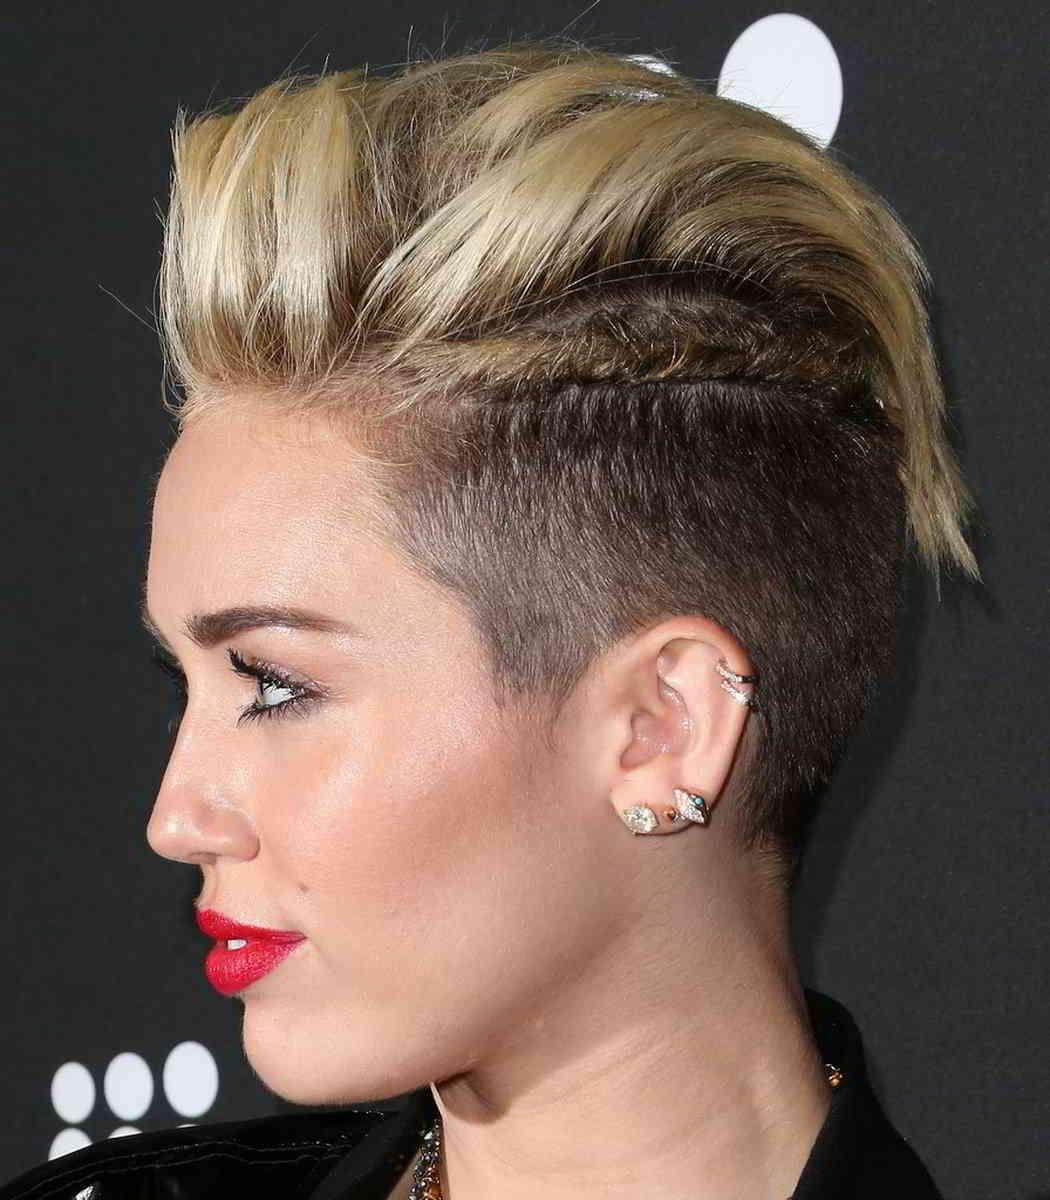 Nice simple hairstyles - Miley Cyrus Hairstyles Are They Nice For Her Simple Hairstyle Ideas For Women